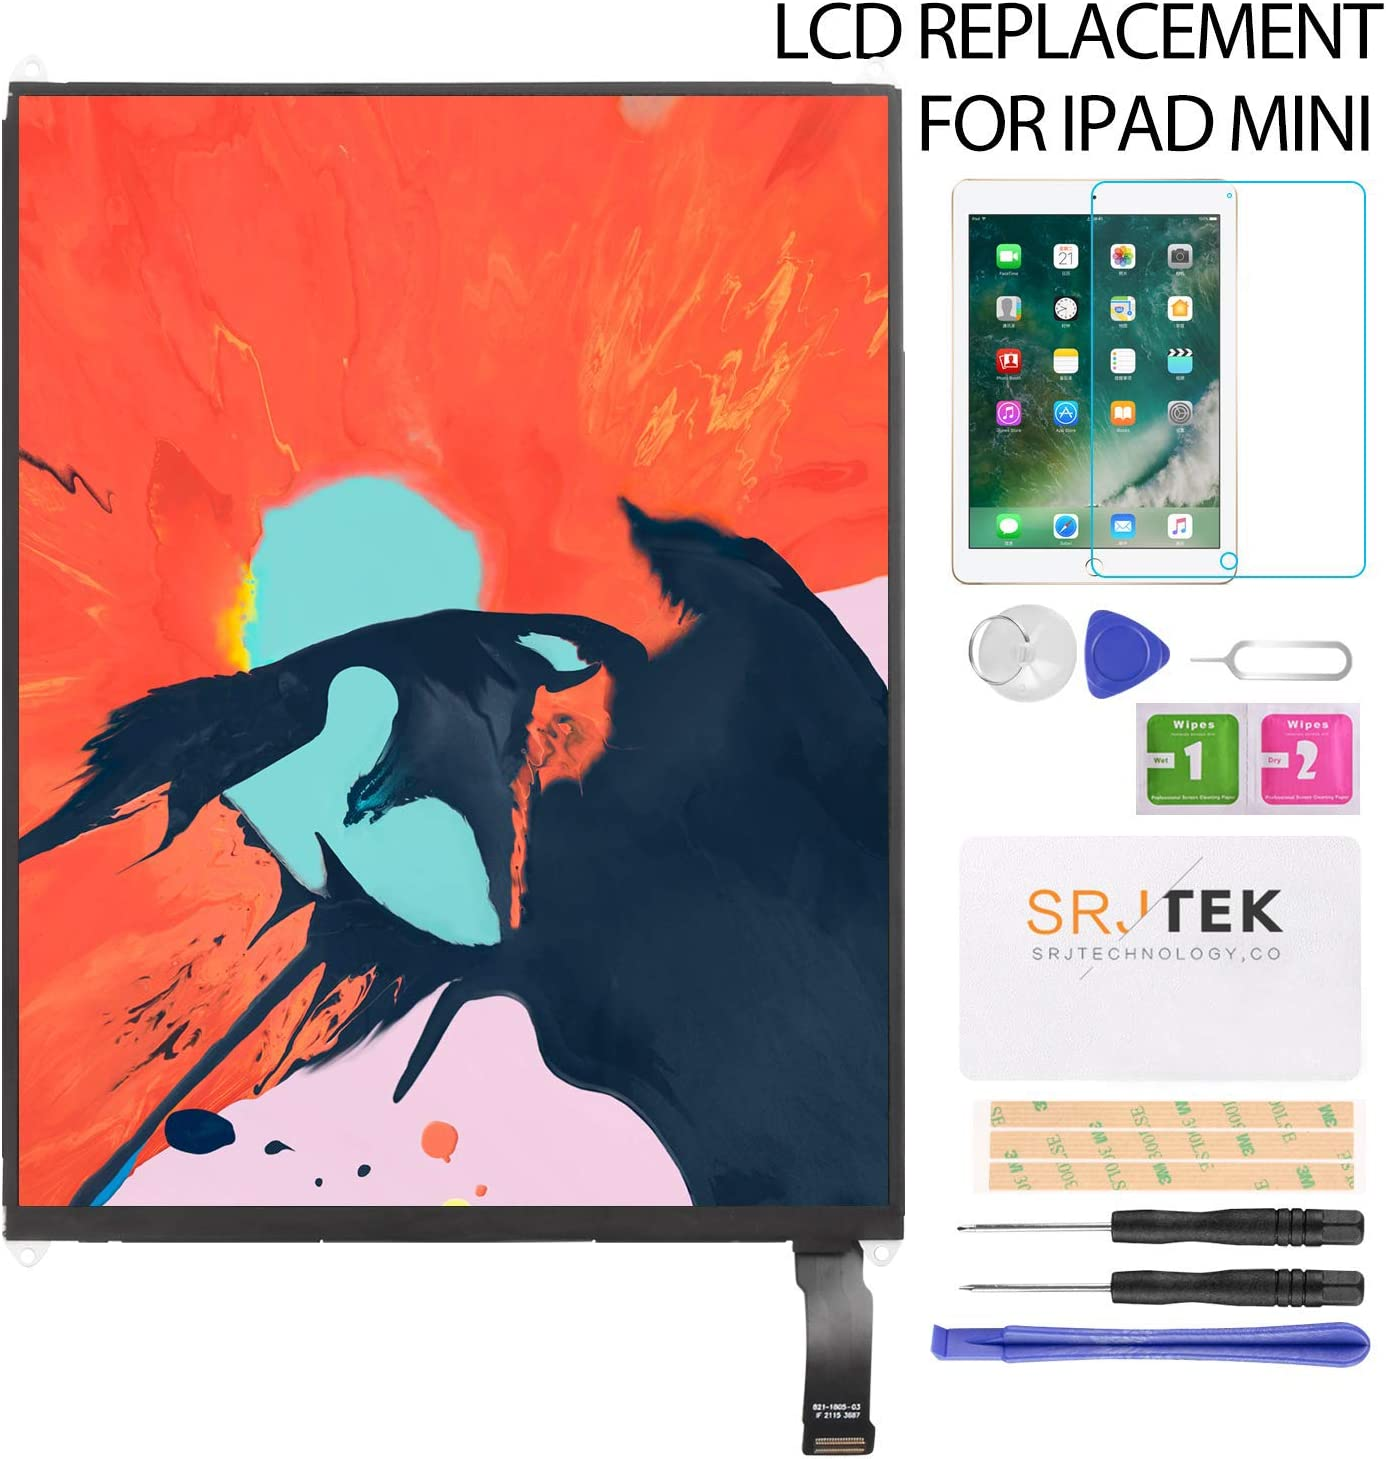 "SRJTEK for iPad Mini A1432 LCD Screen Replacement,for ipad Mini 7.9"" A1432 A1455 A1454 LCD Display Screen Panel Repair Parts Kits"